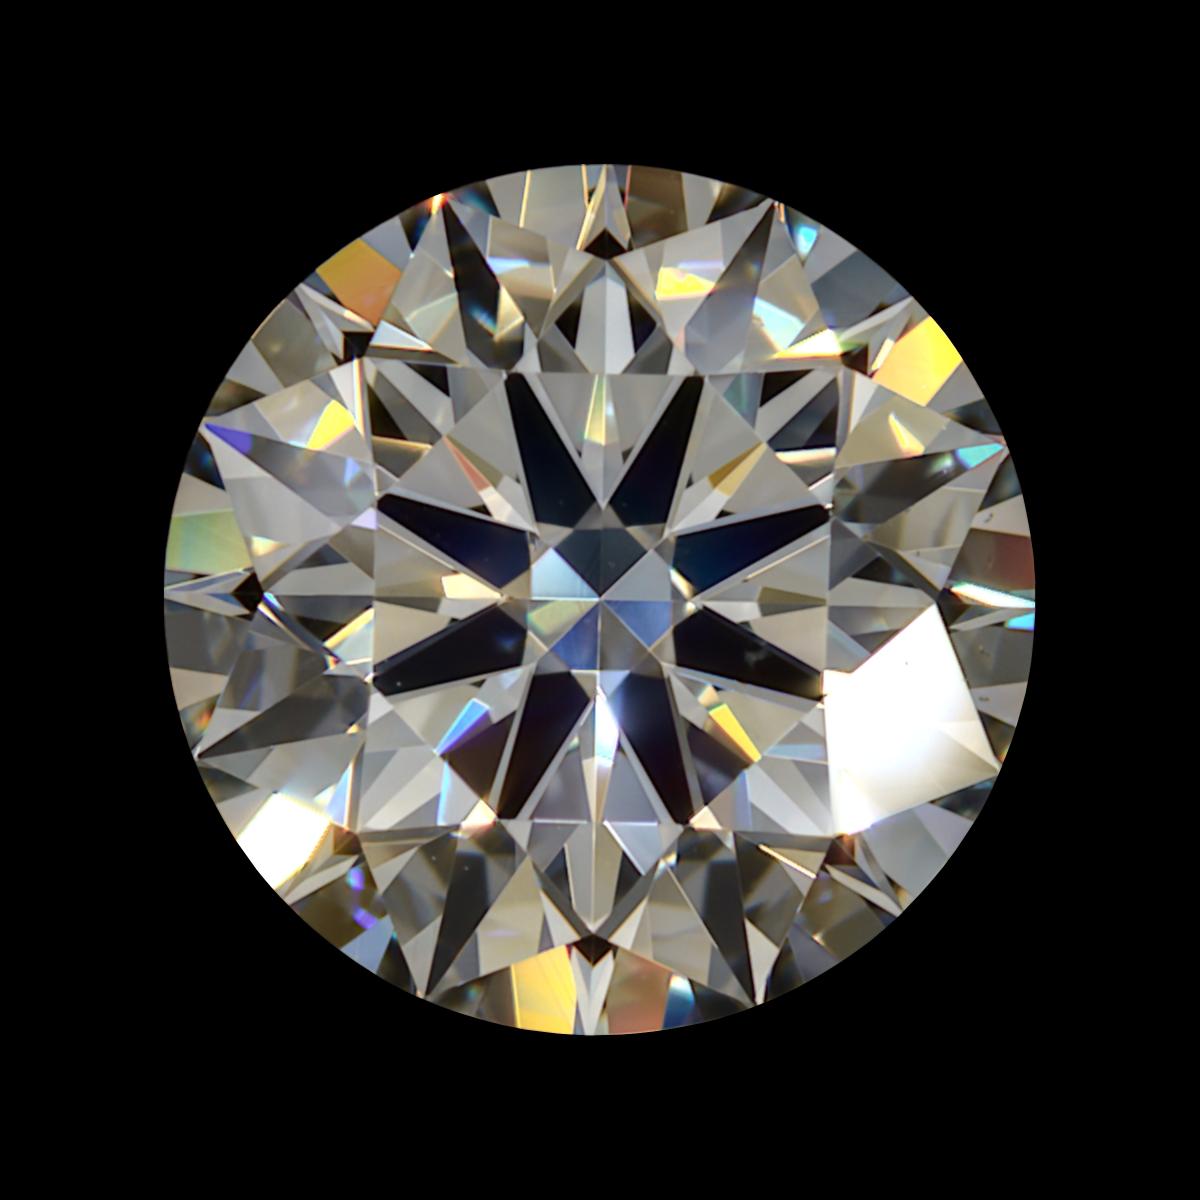 https://cdn.briangavindiamonds.com/files/mp4/AGS-104114551017/AGS-104114551017-Fire-02.mp4